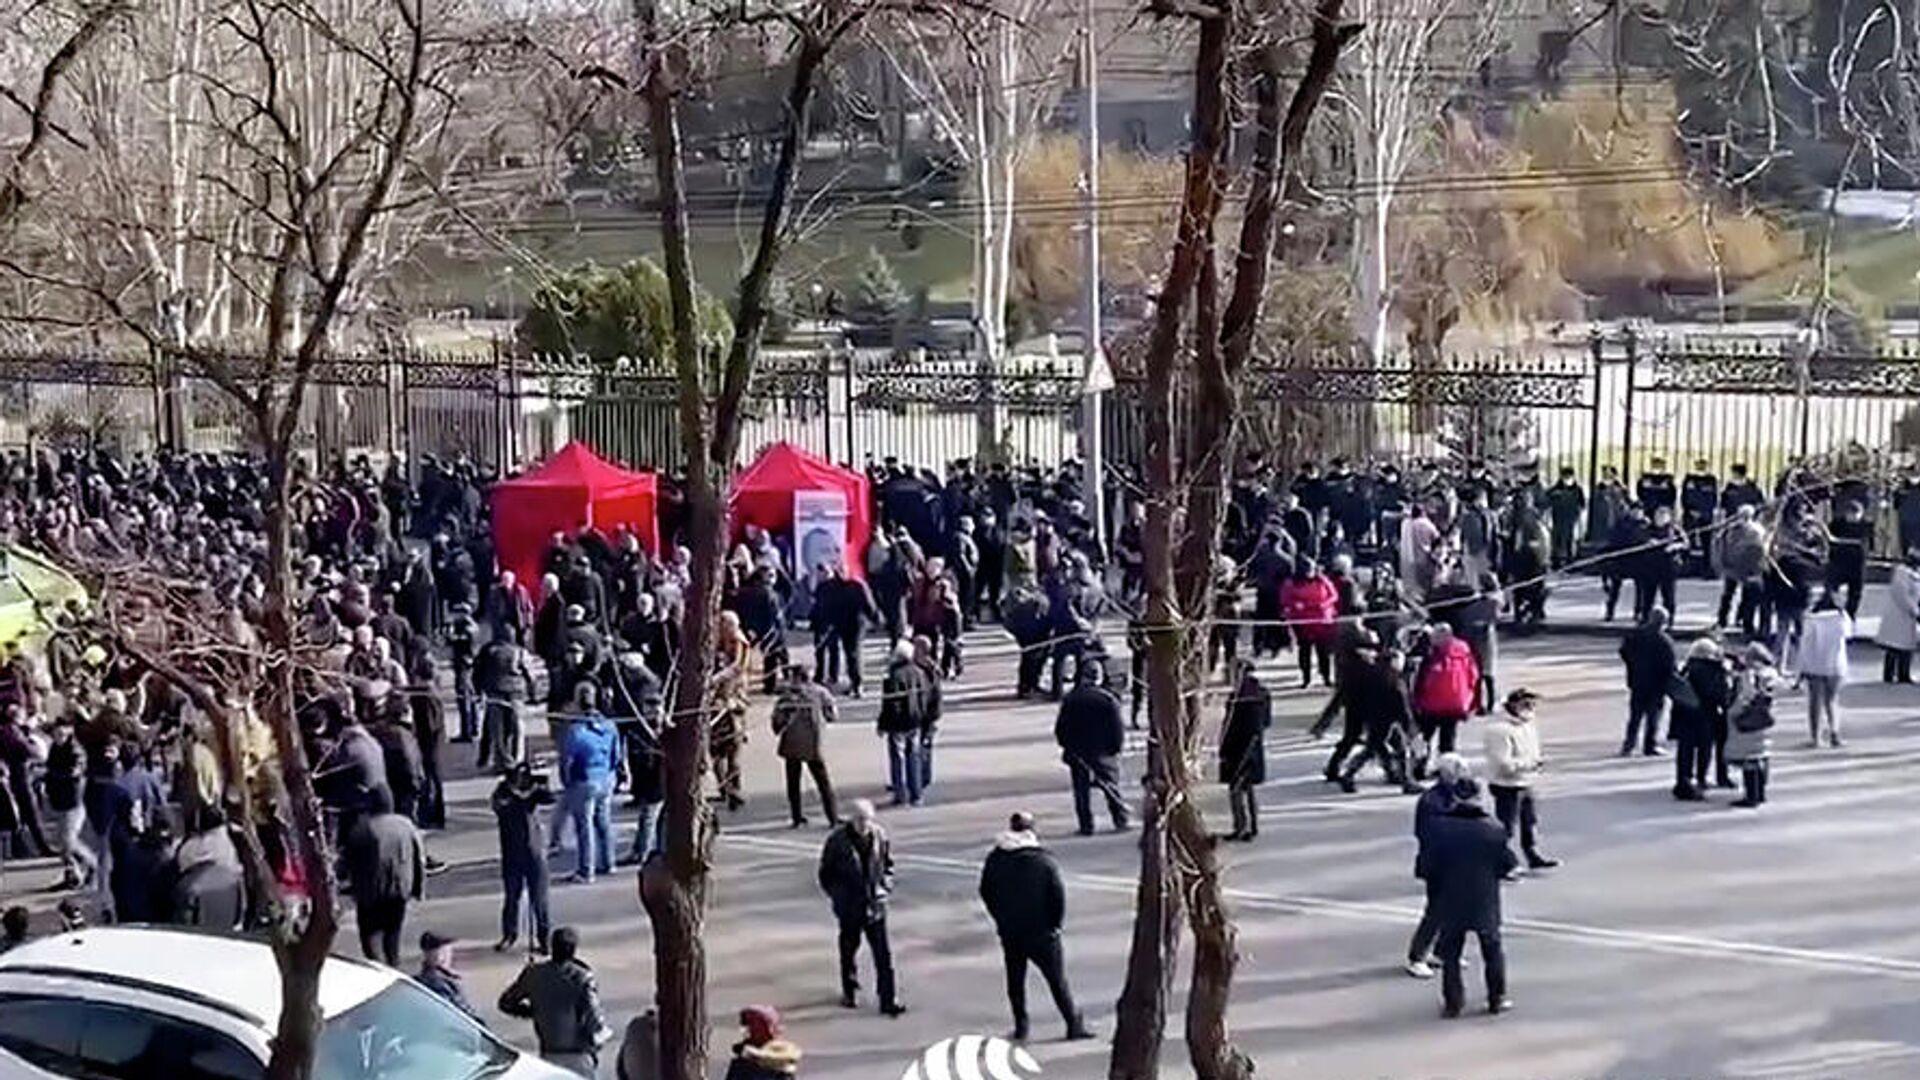 Сторонники оппозиции у здания парламента Армении в Ереване. Кадр видео - РИА Новости, 1920, 03.03.2021